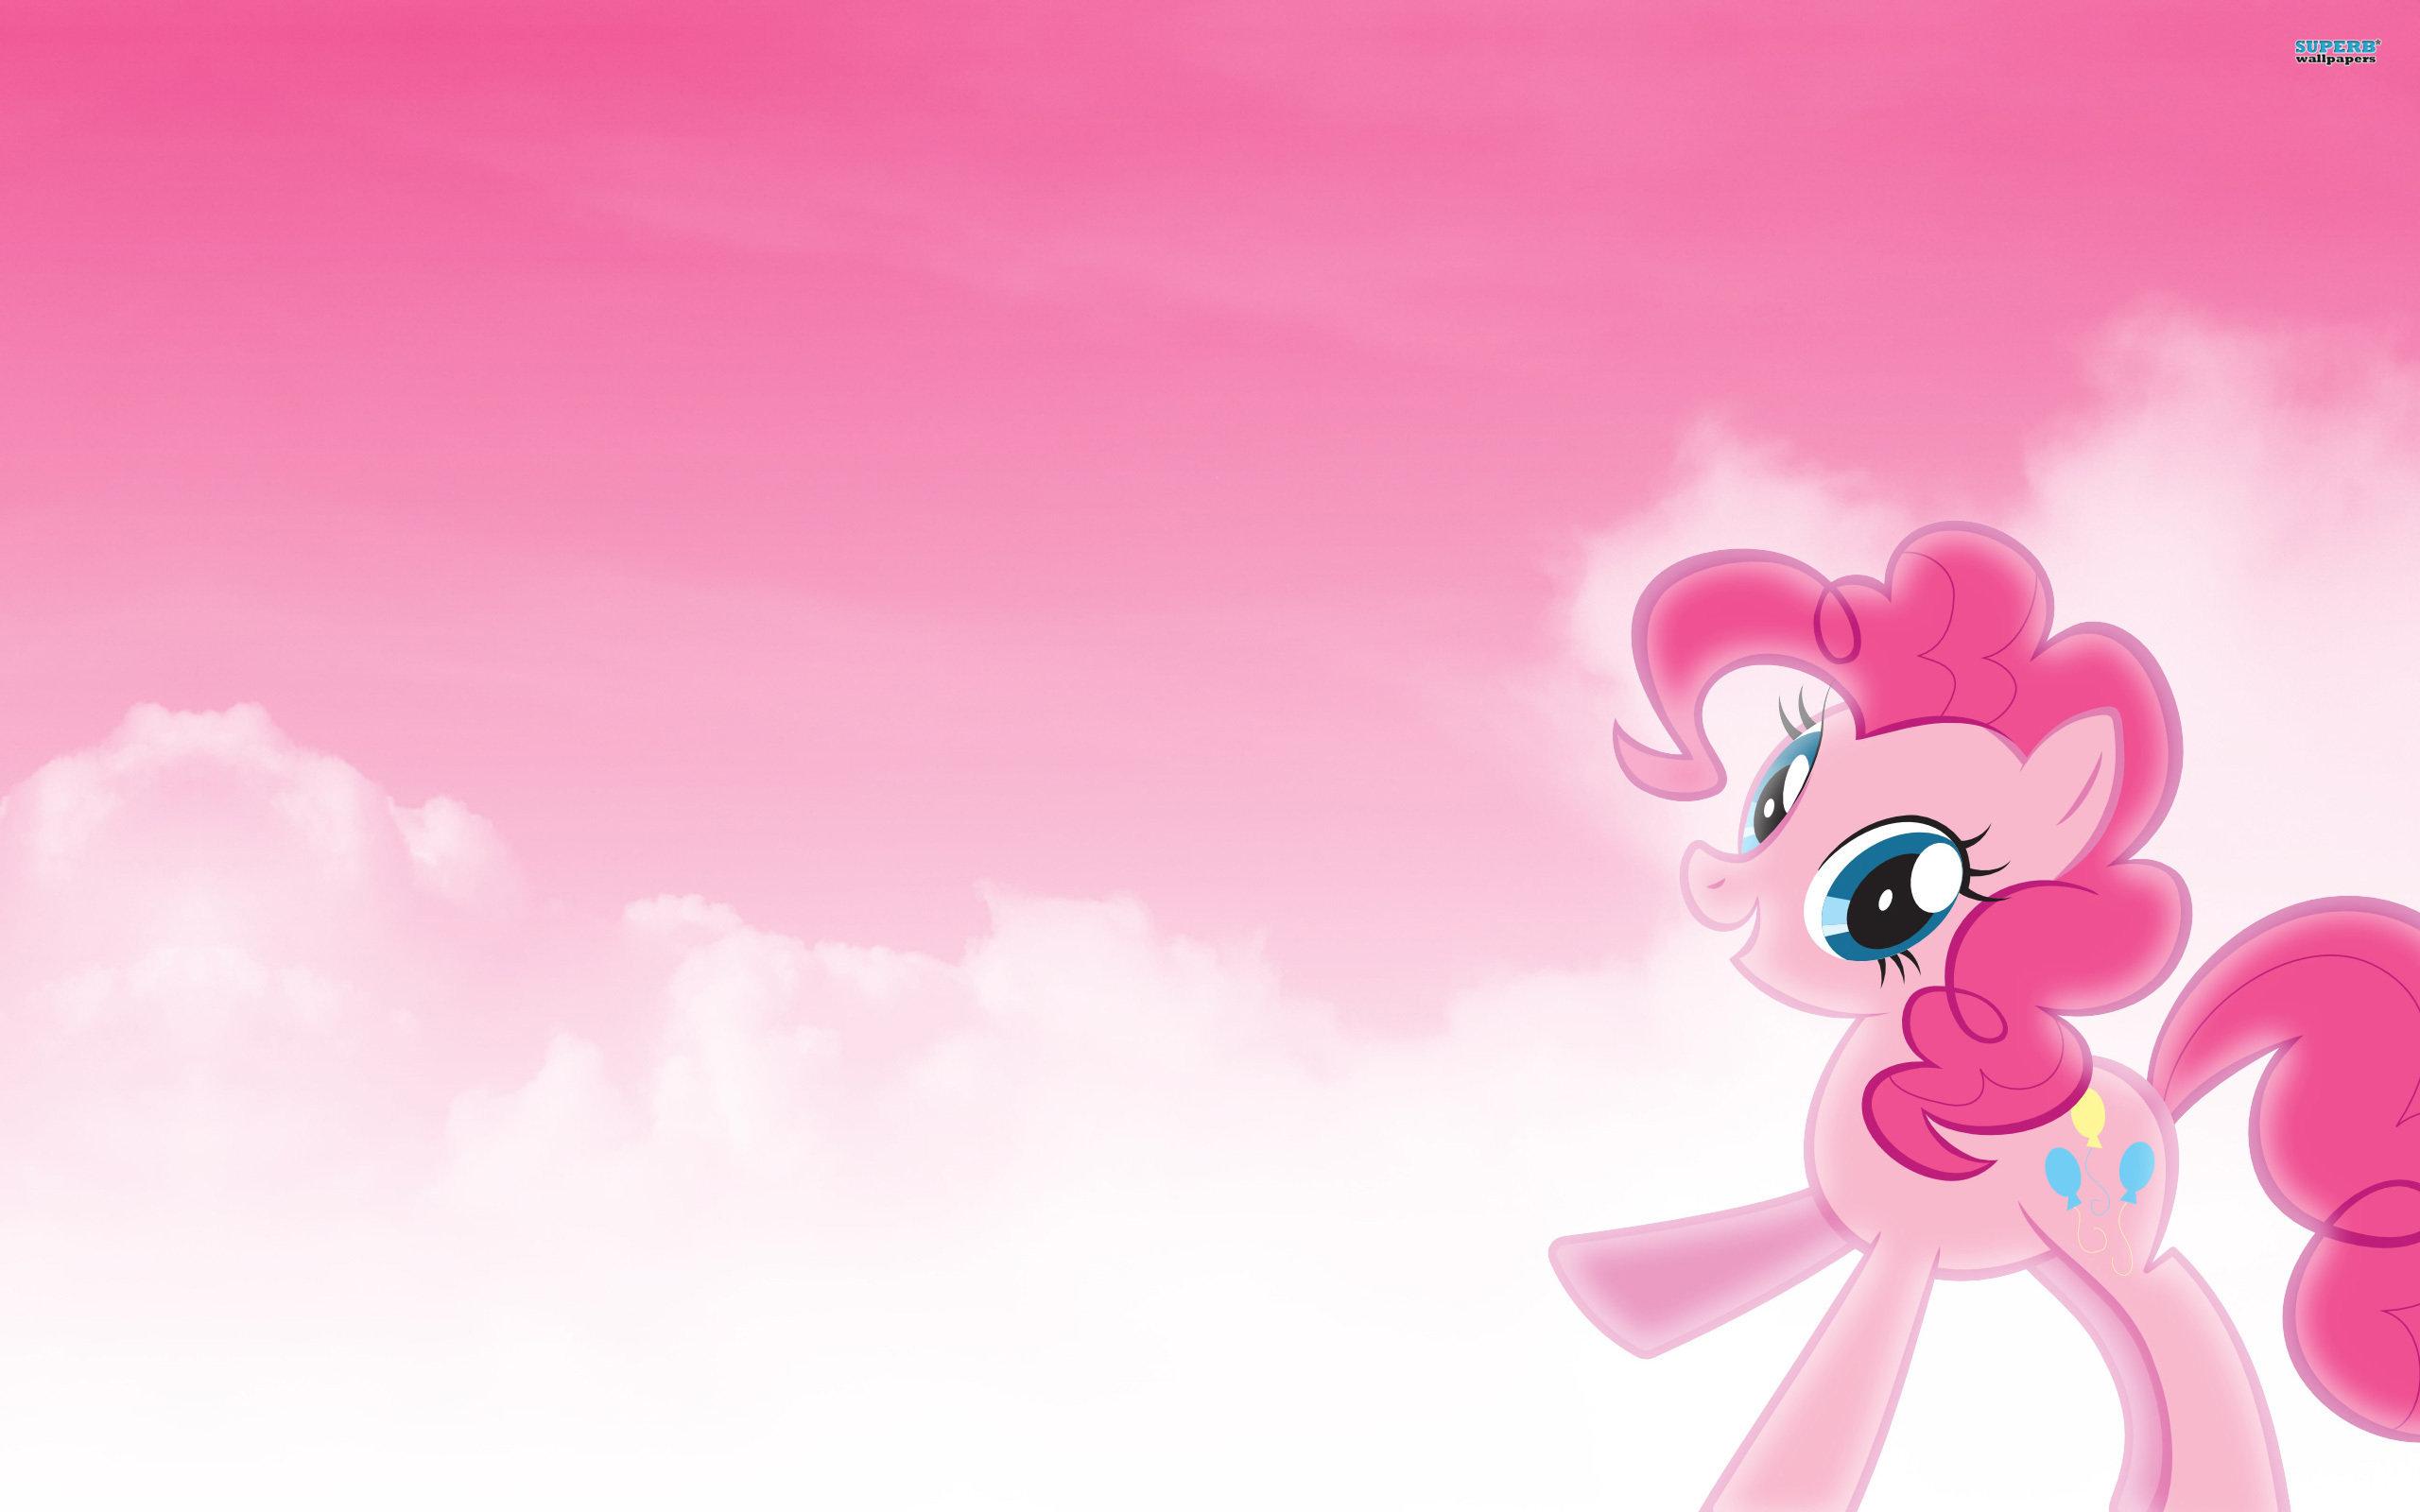 Download Hd 2560x1600 Pinkie Pie Desktop Background ID154266 For Free